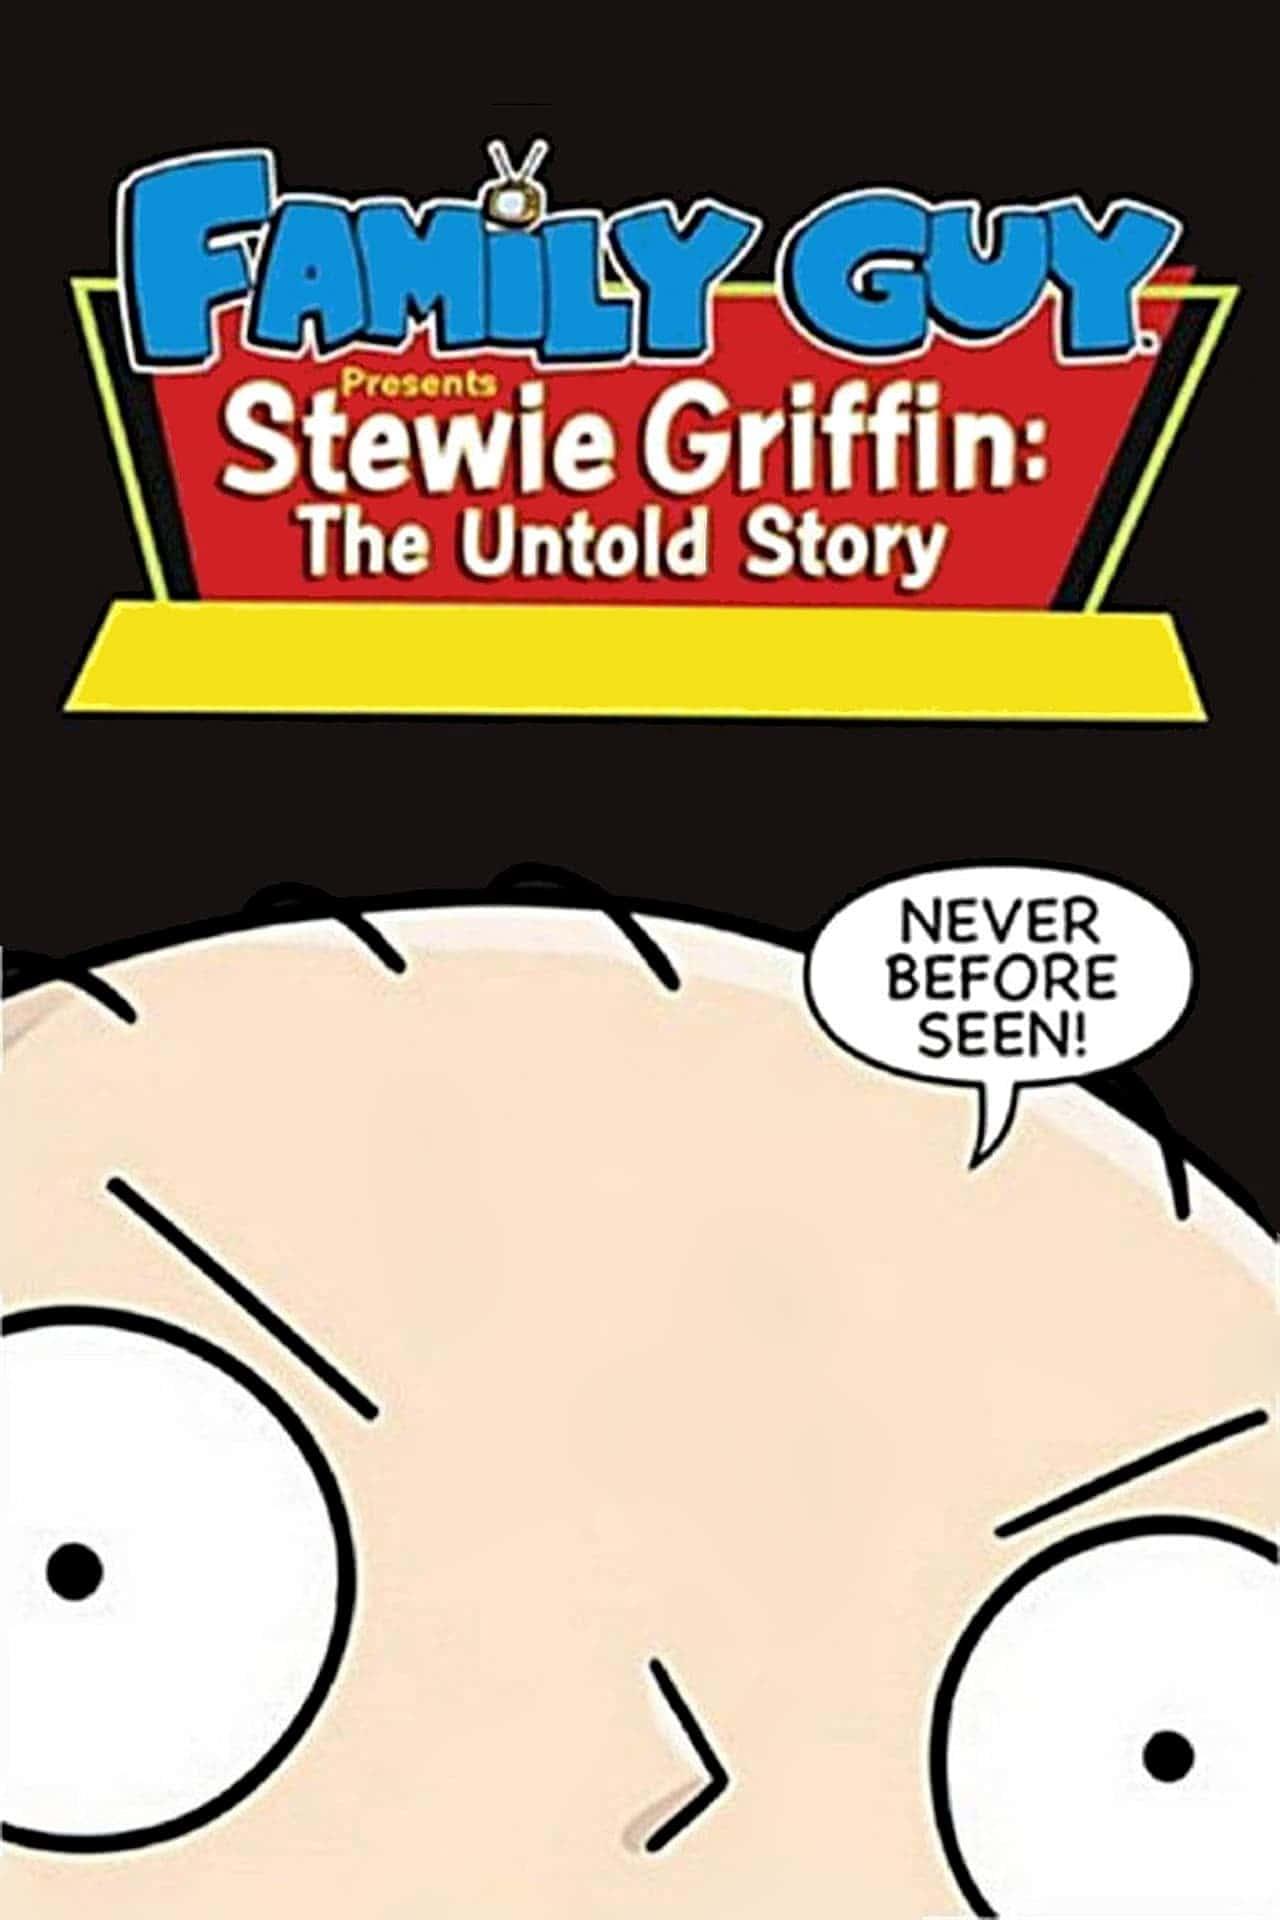 Regarder L'incroyable histoire de Stewie Griffin en streaming gratuit